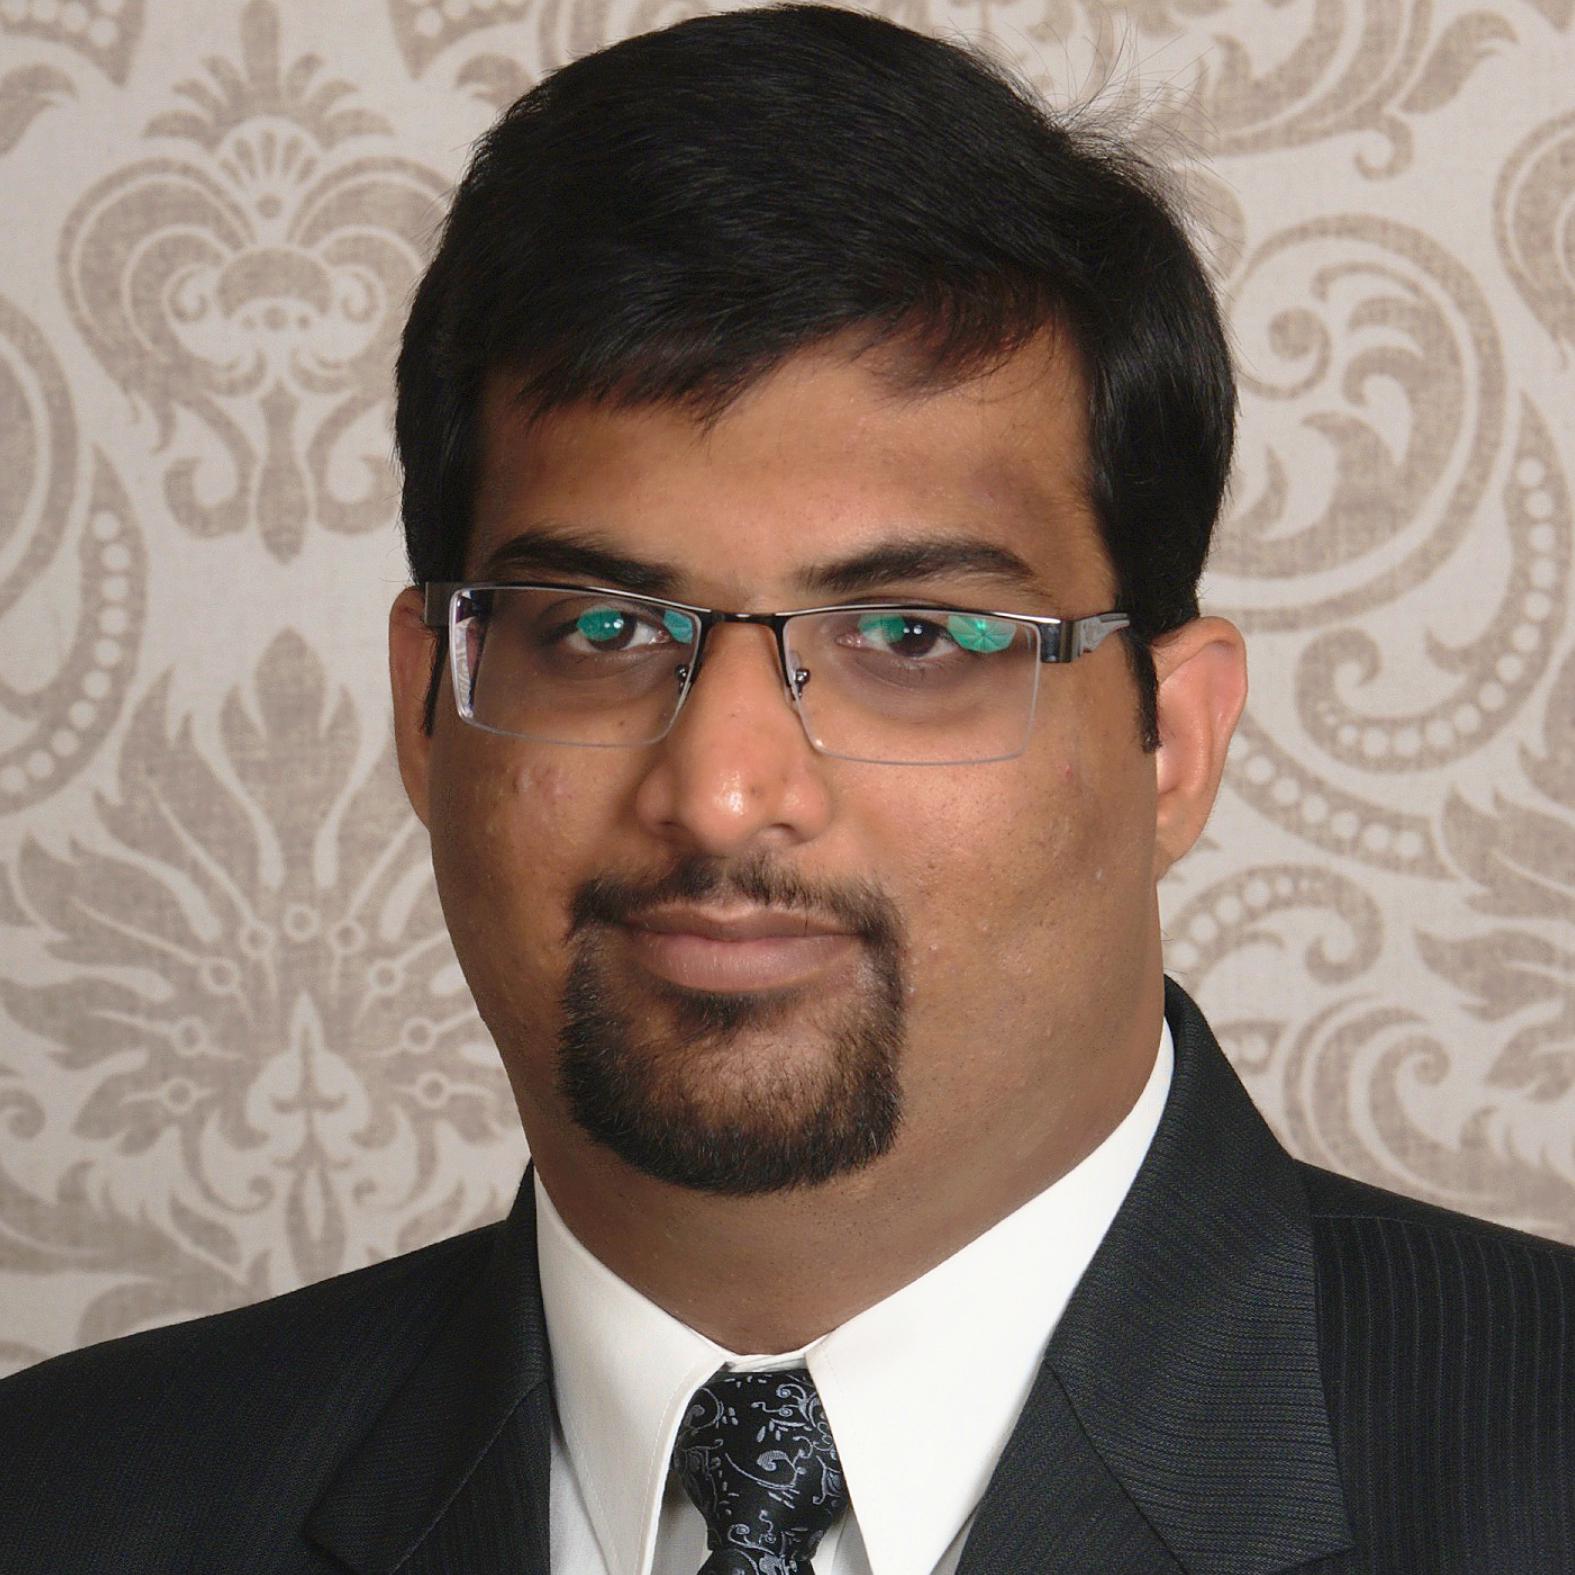 Photo of Ishanjit Singh Badwal